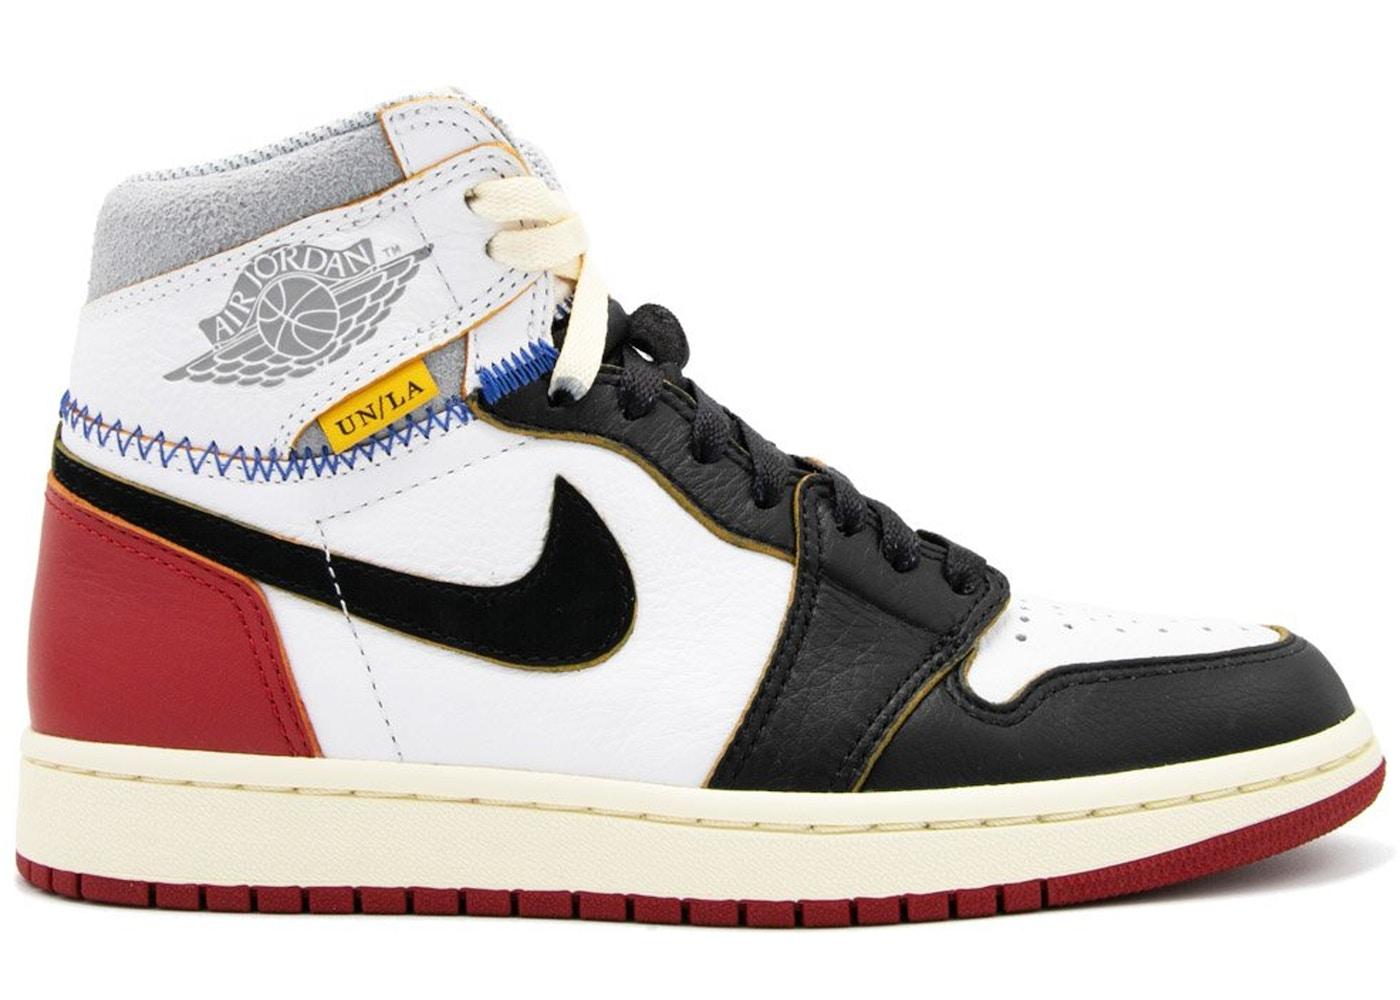 Jordan 1 Retro High Union Los Angeles Black Toe Buy Sell On Stockx